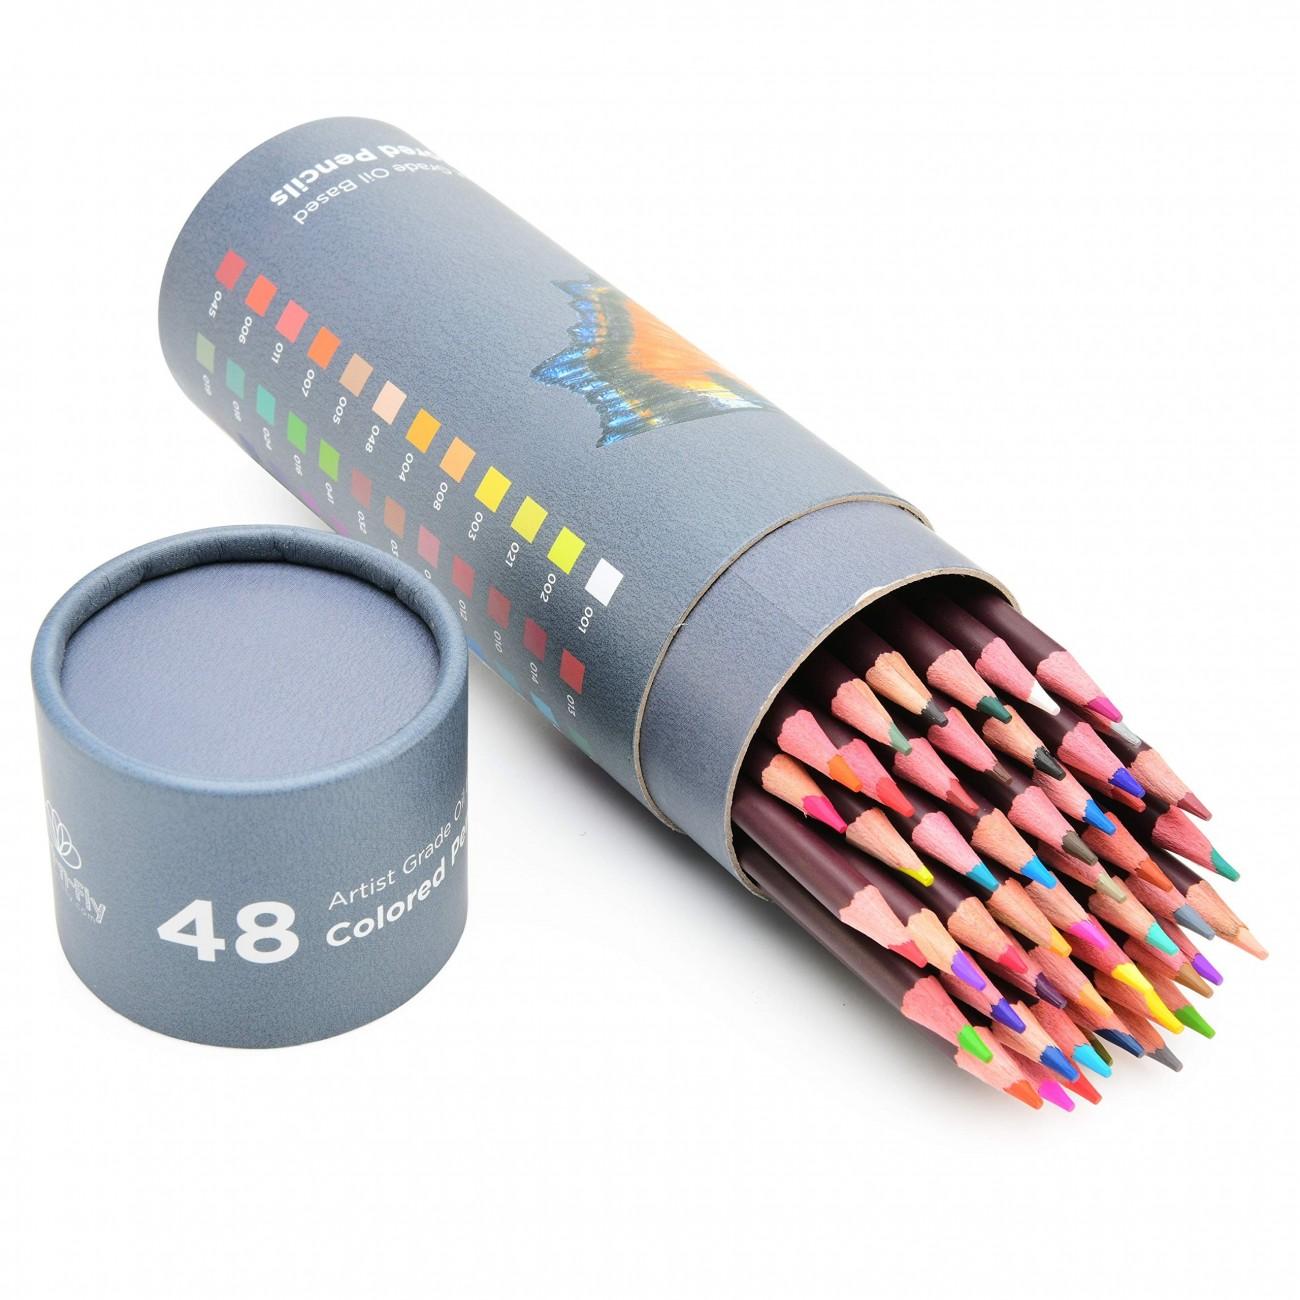 48 Lápices De Colores De Dibujo Profesional Para Artistas Lápices Con Base De óleo Incluye Lápiz Color Carne